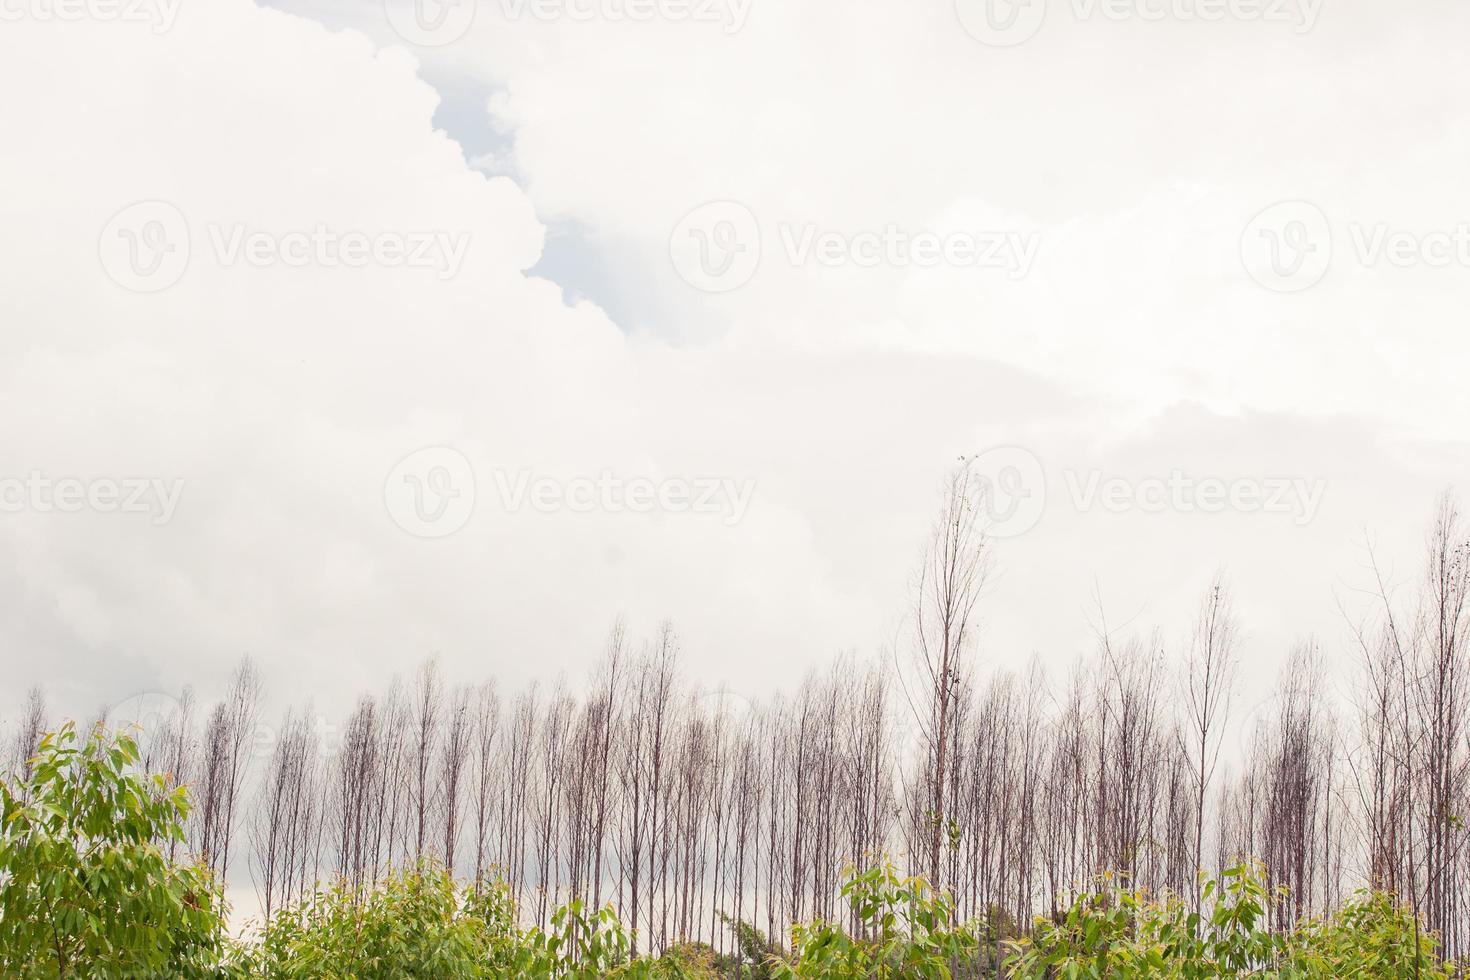 torkade träd i molnig himmel foto